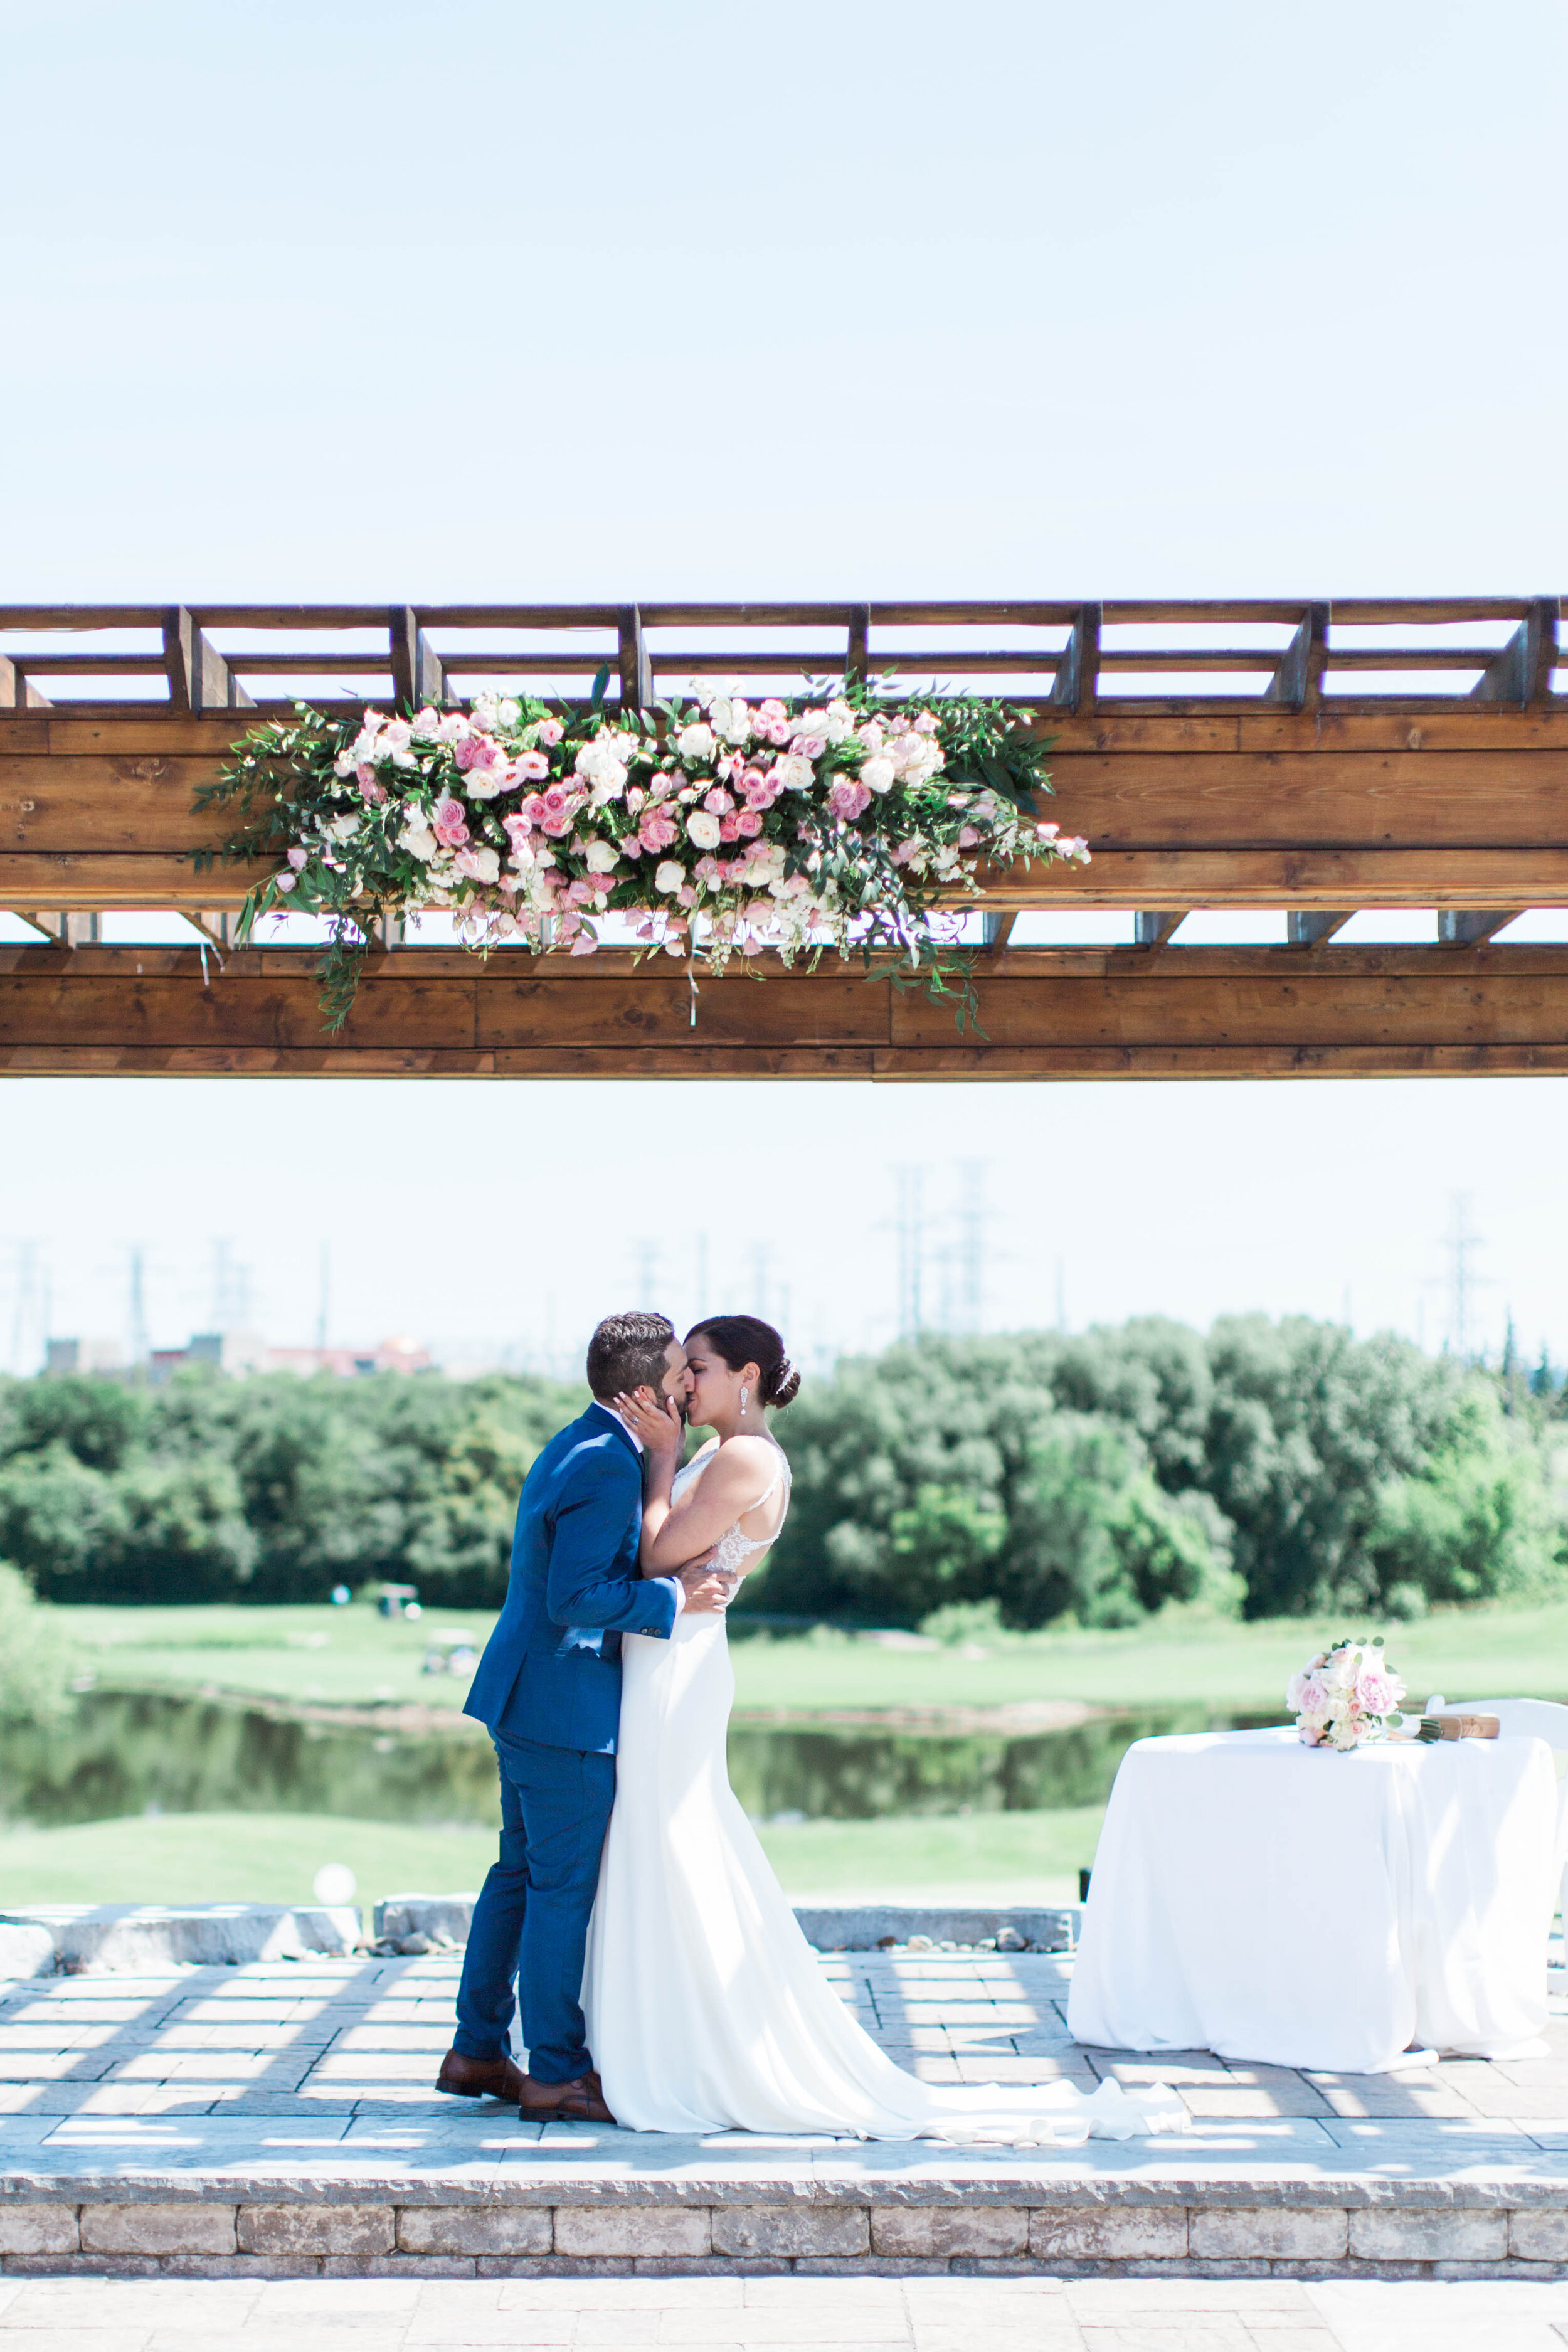 Bride and Groom Kiss Under Wedding Arbour - Trendy Modern Brunch Wedding - Historia Wedding and Event Planning